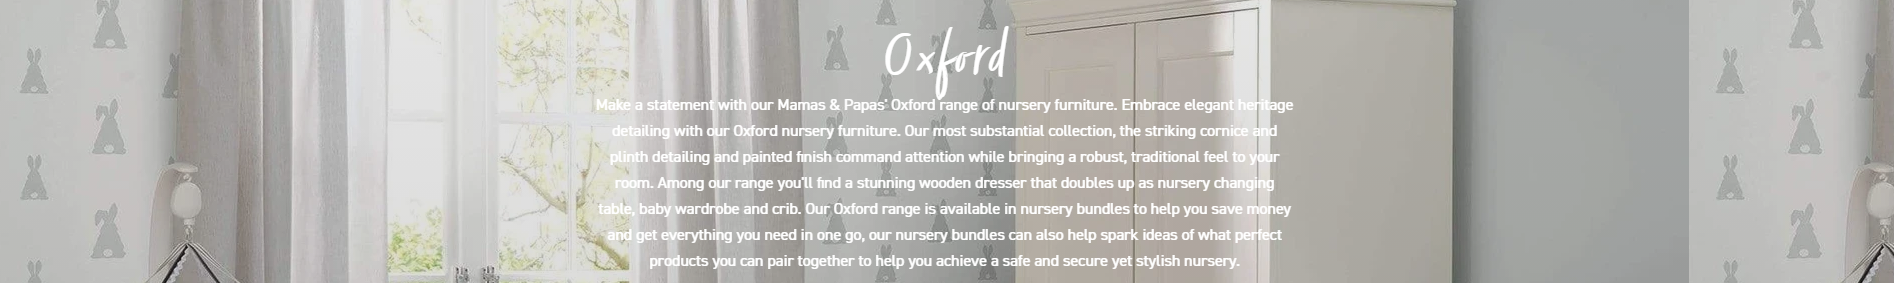 Oxford kolekcija